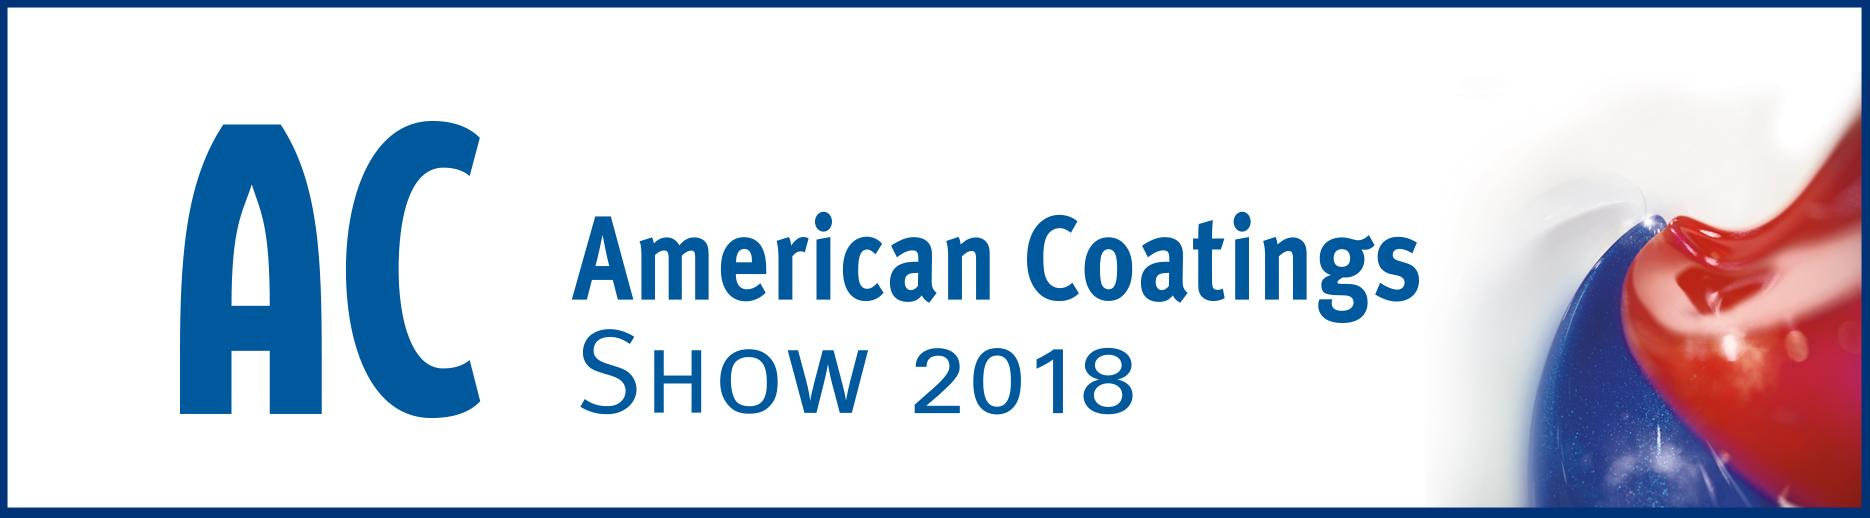 ACS-2018 logo.jpg